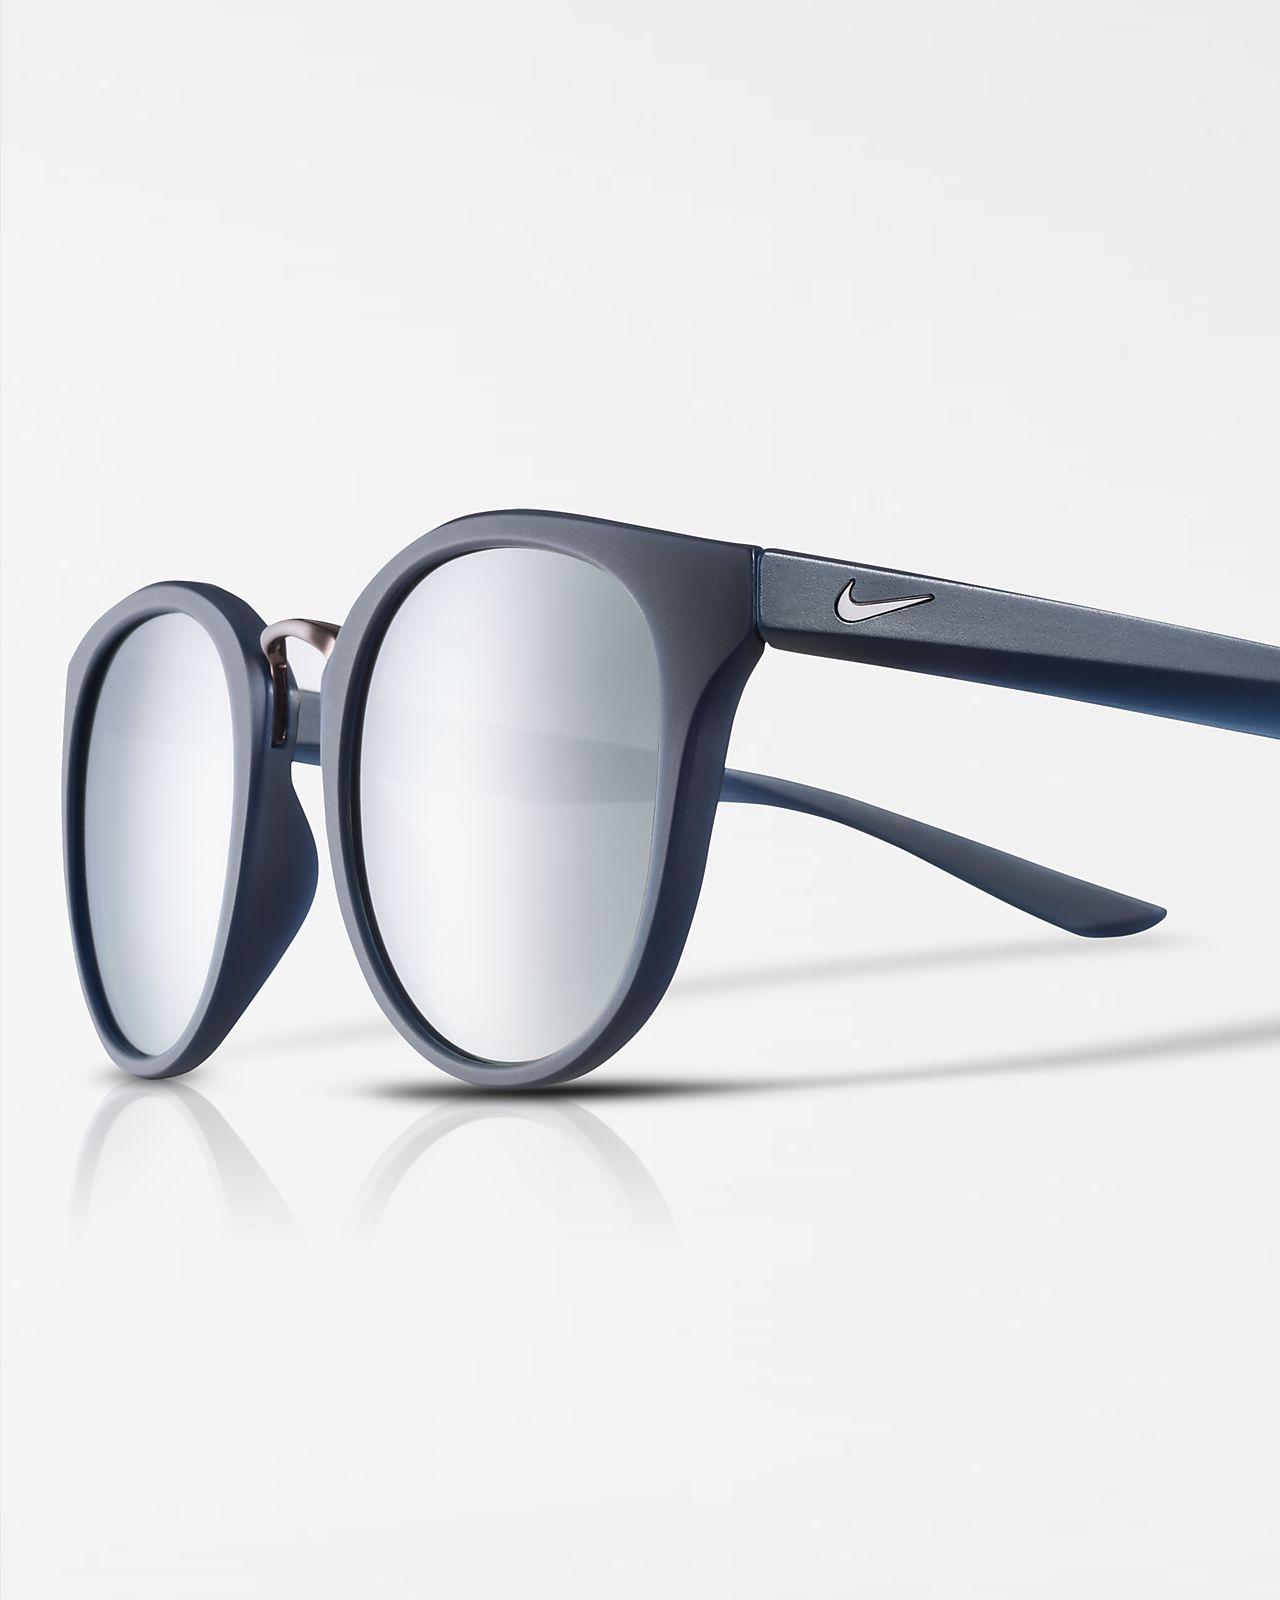 Lunettes de soleil Nike Revere Mirrored